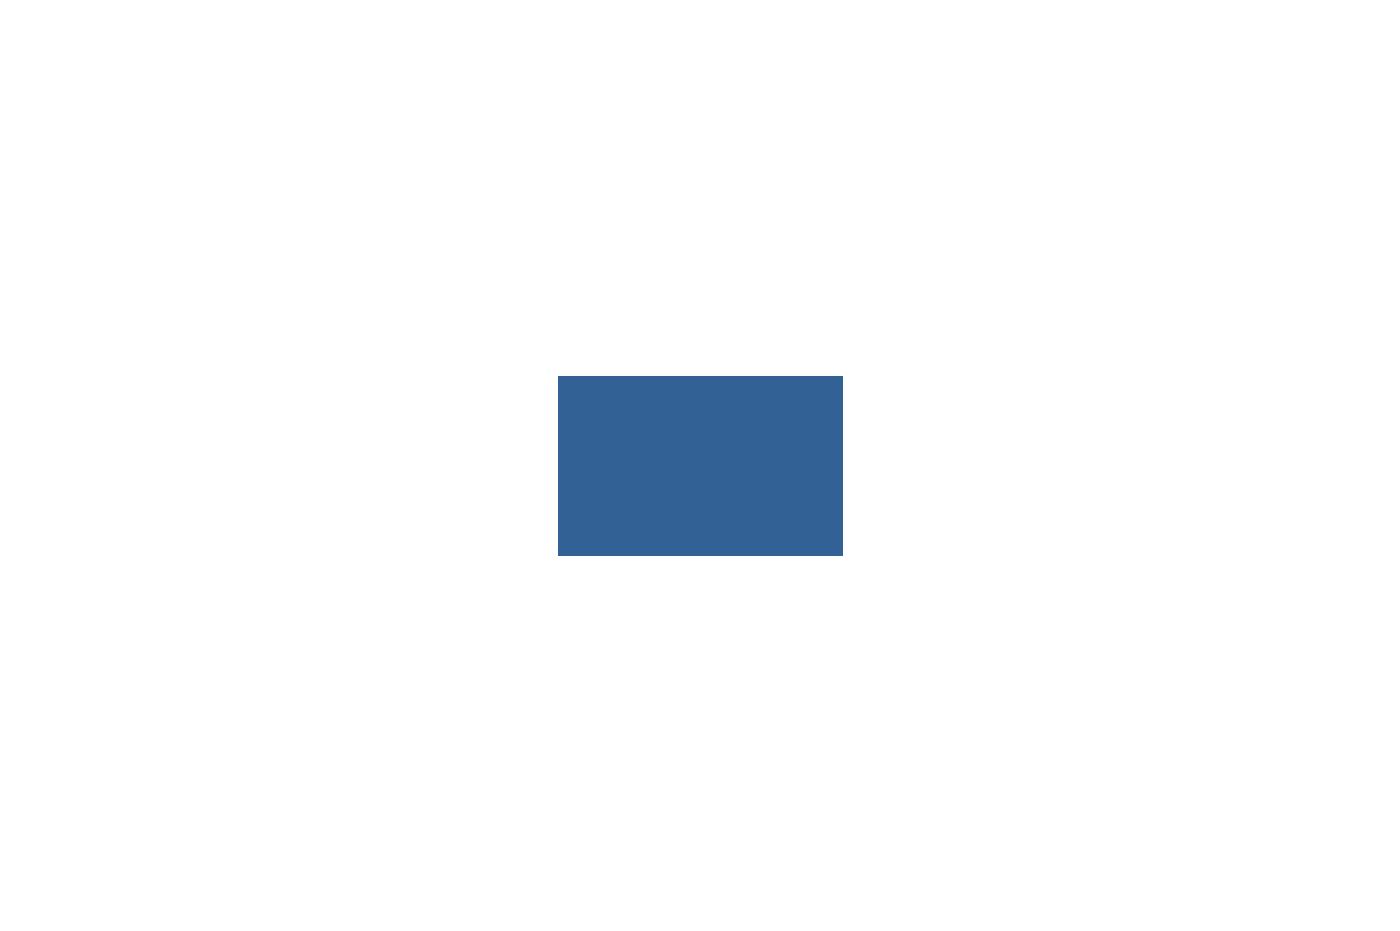 brent-freeman-personal-brand-02.png